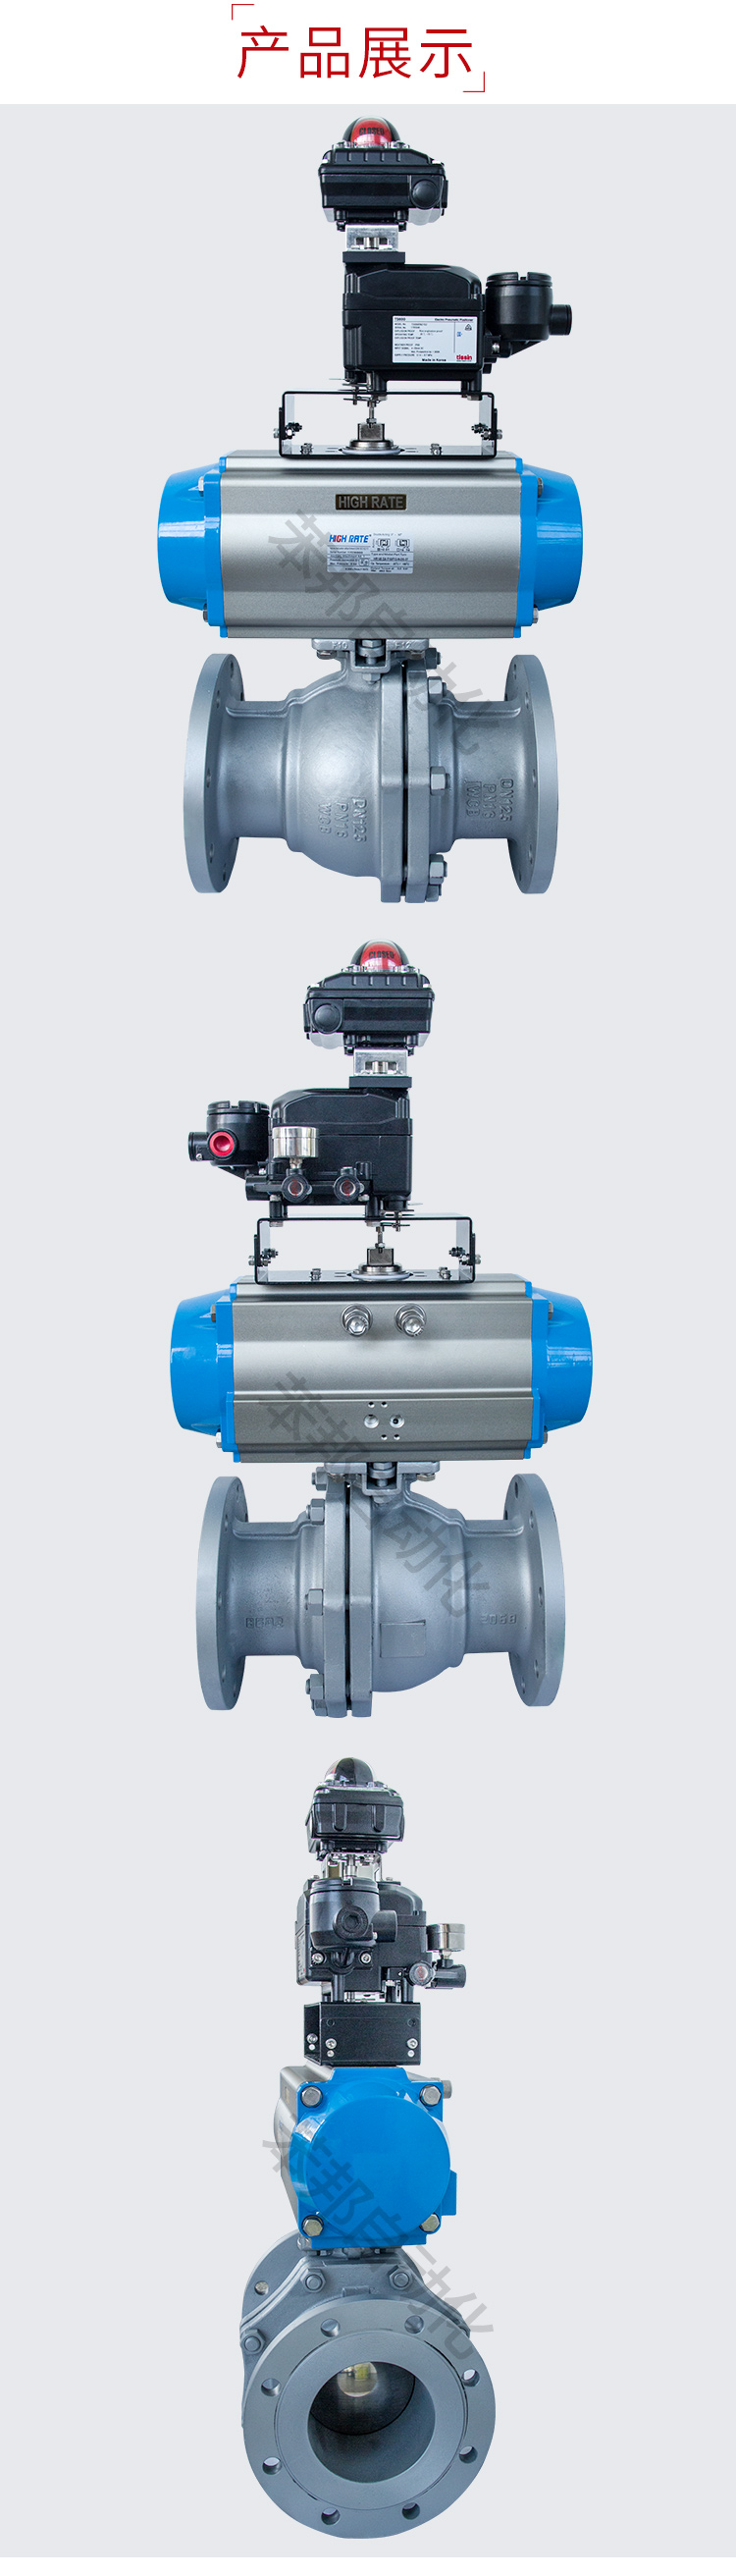 HIGHRATE气动法兰球阀带附件/WCB碳钢球阀